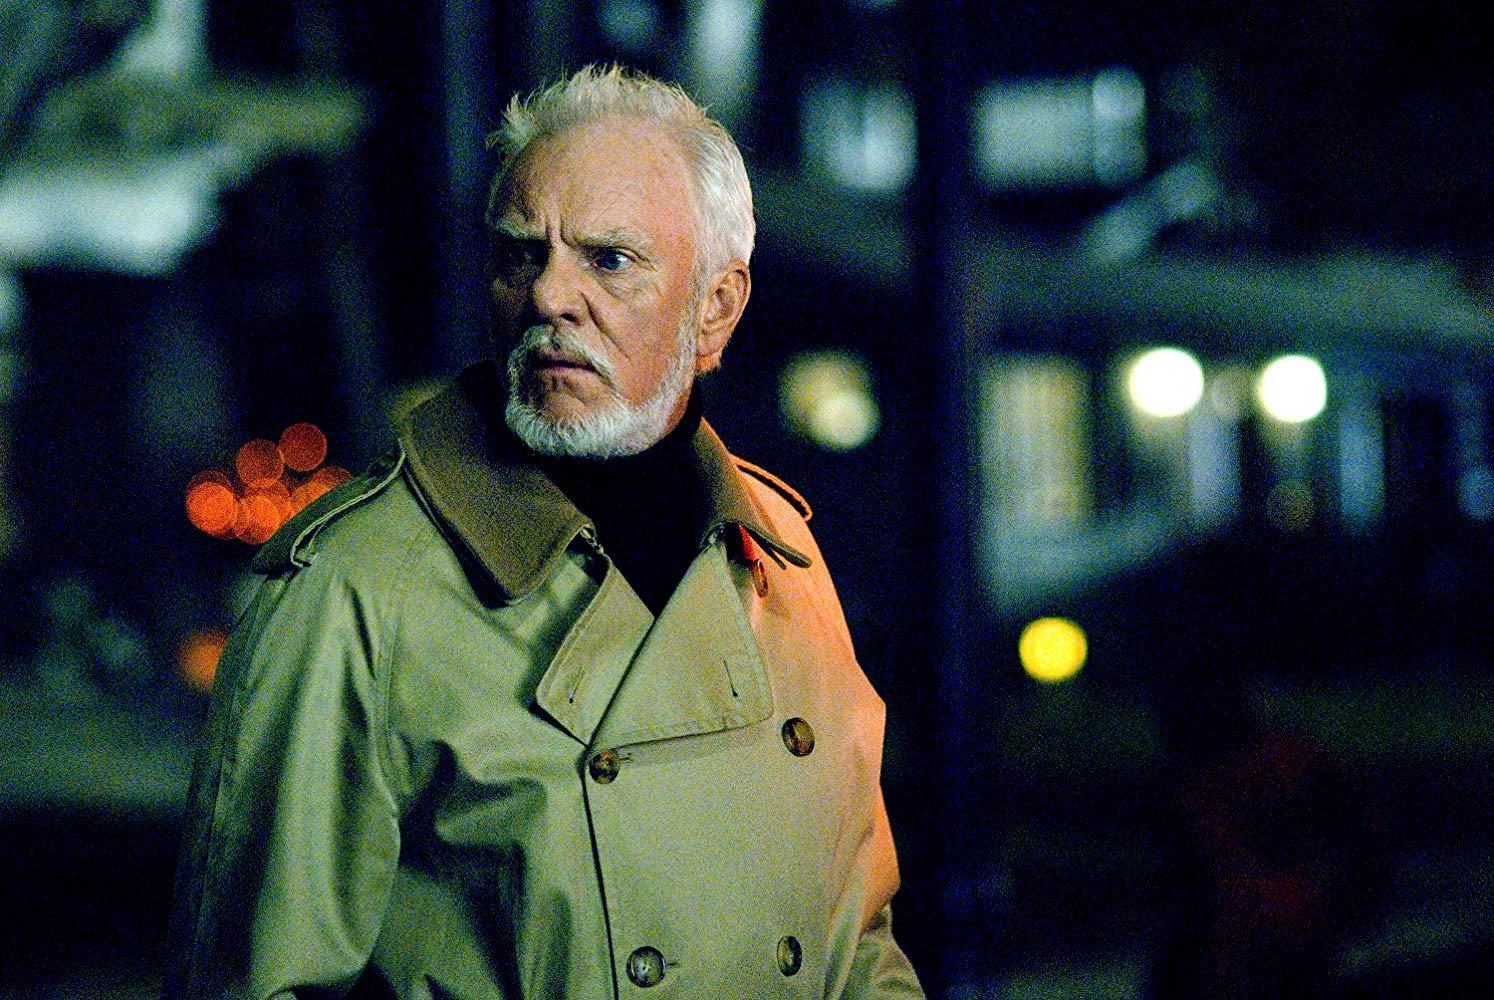 Malcolm McDowell as Dr Loomis in Halloween (2007)